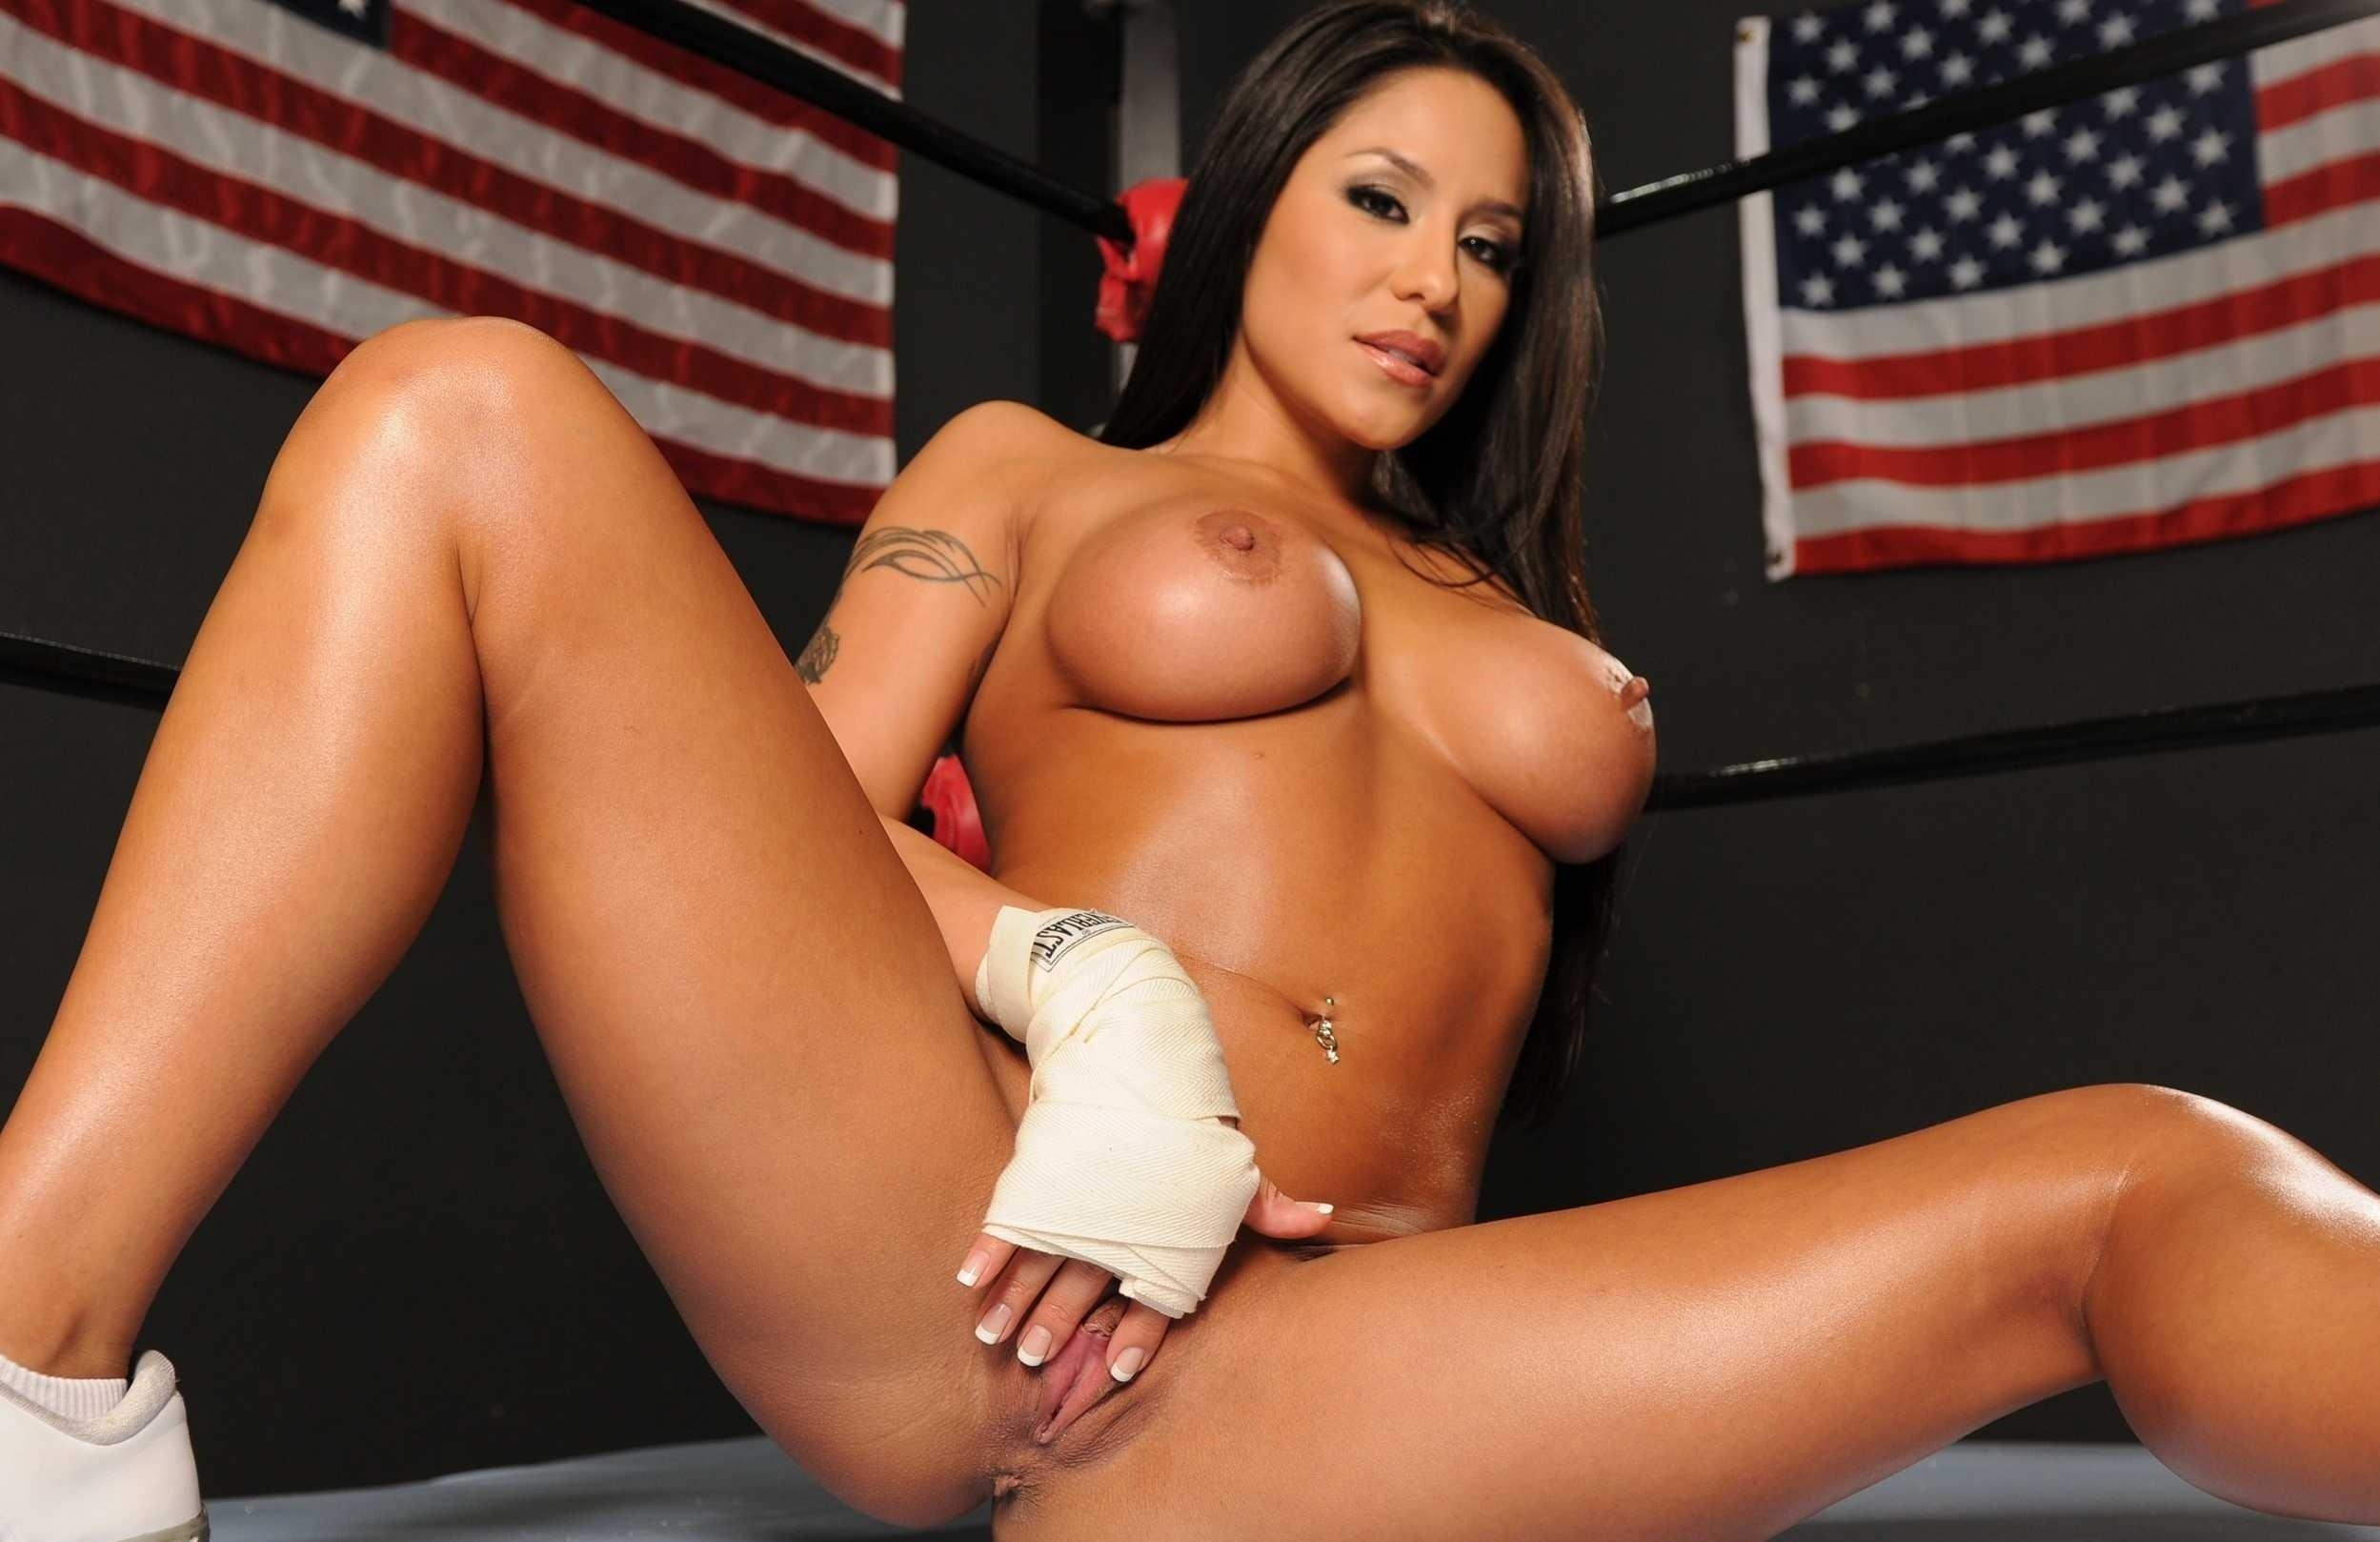 Nikki bella tits